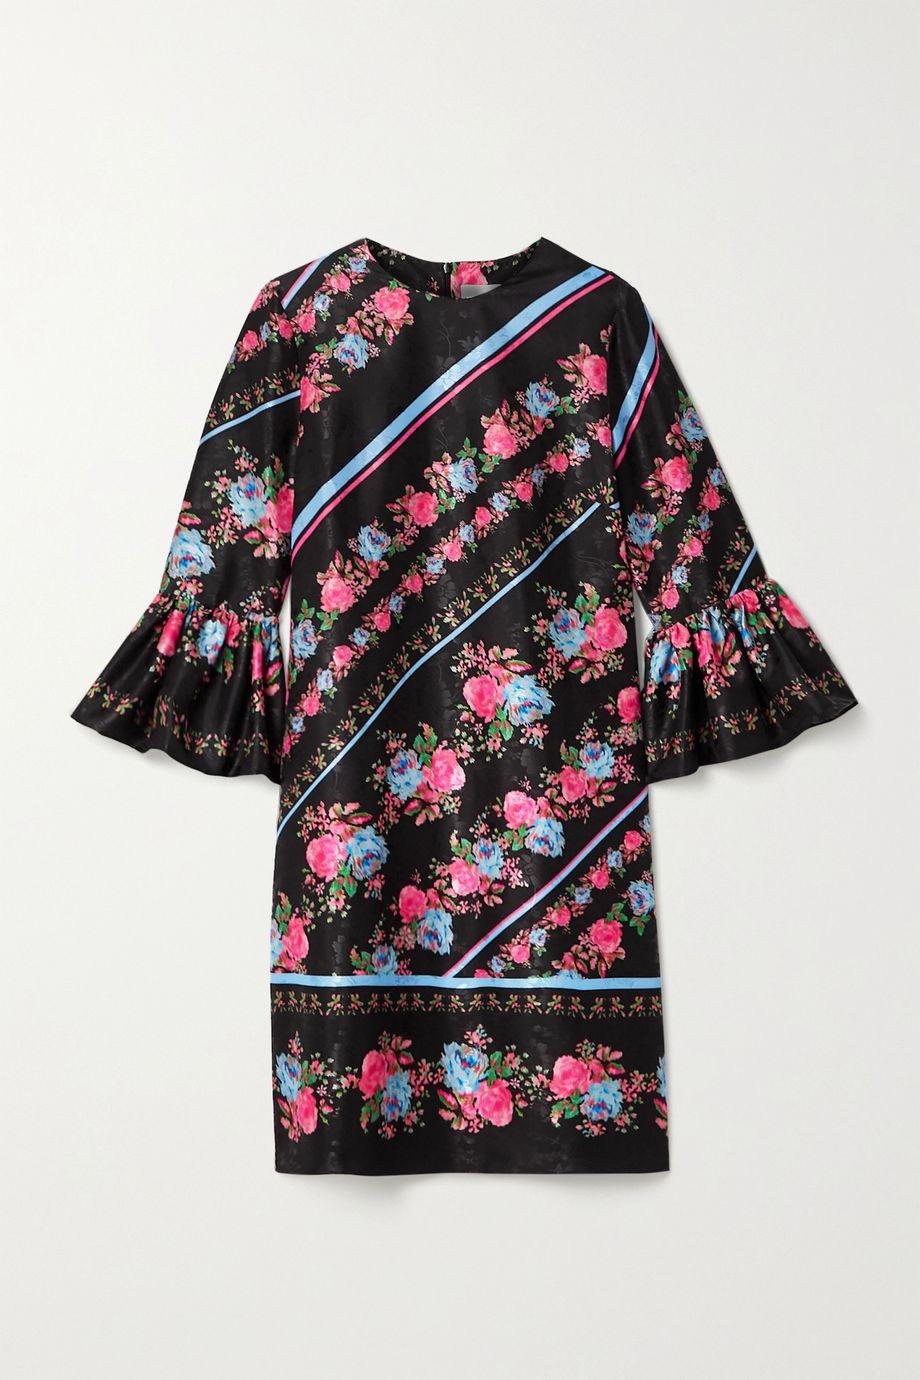 Erdem Elijah floral-print satin-jacquard mini dress